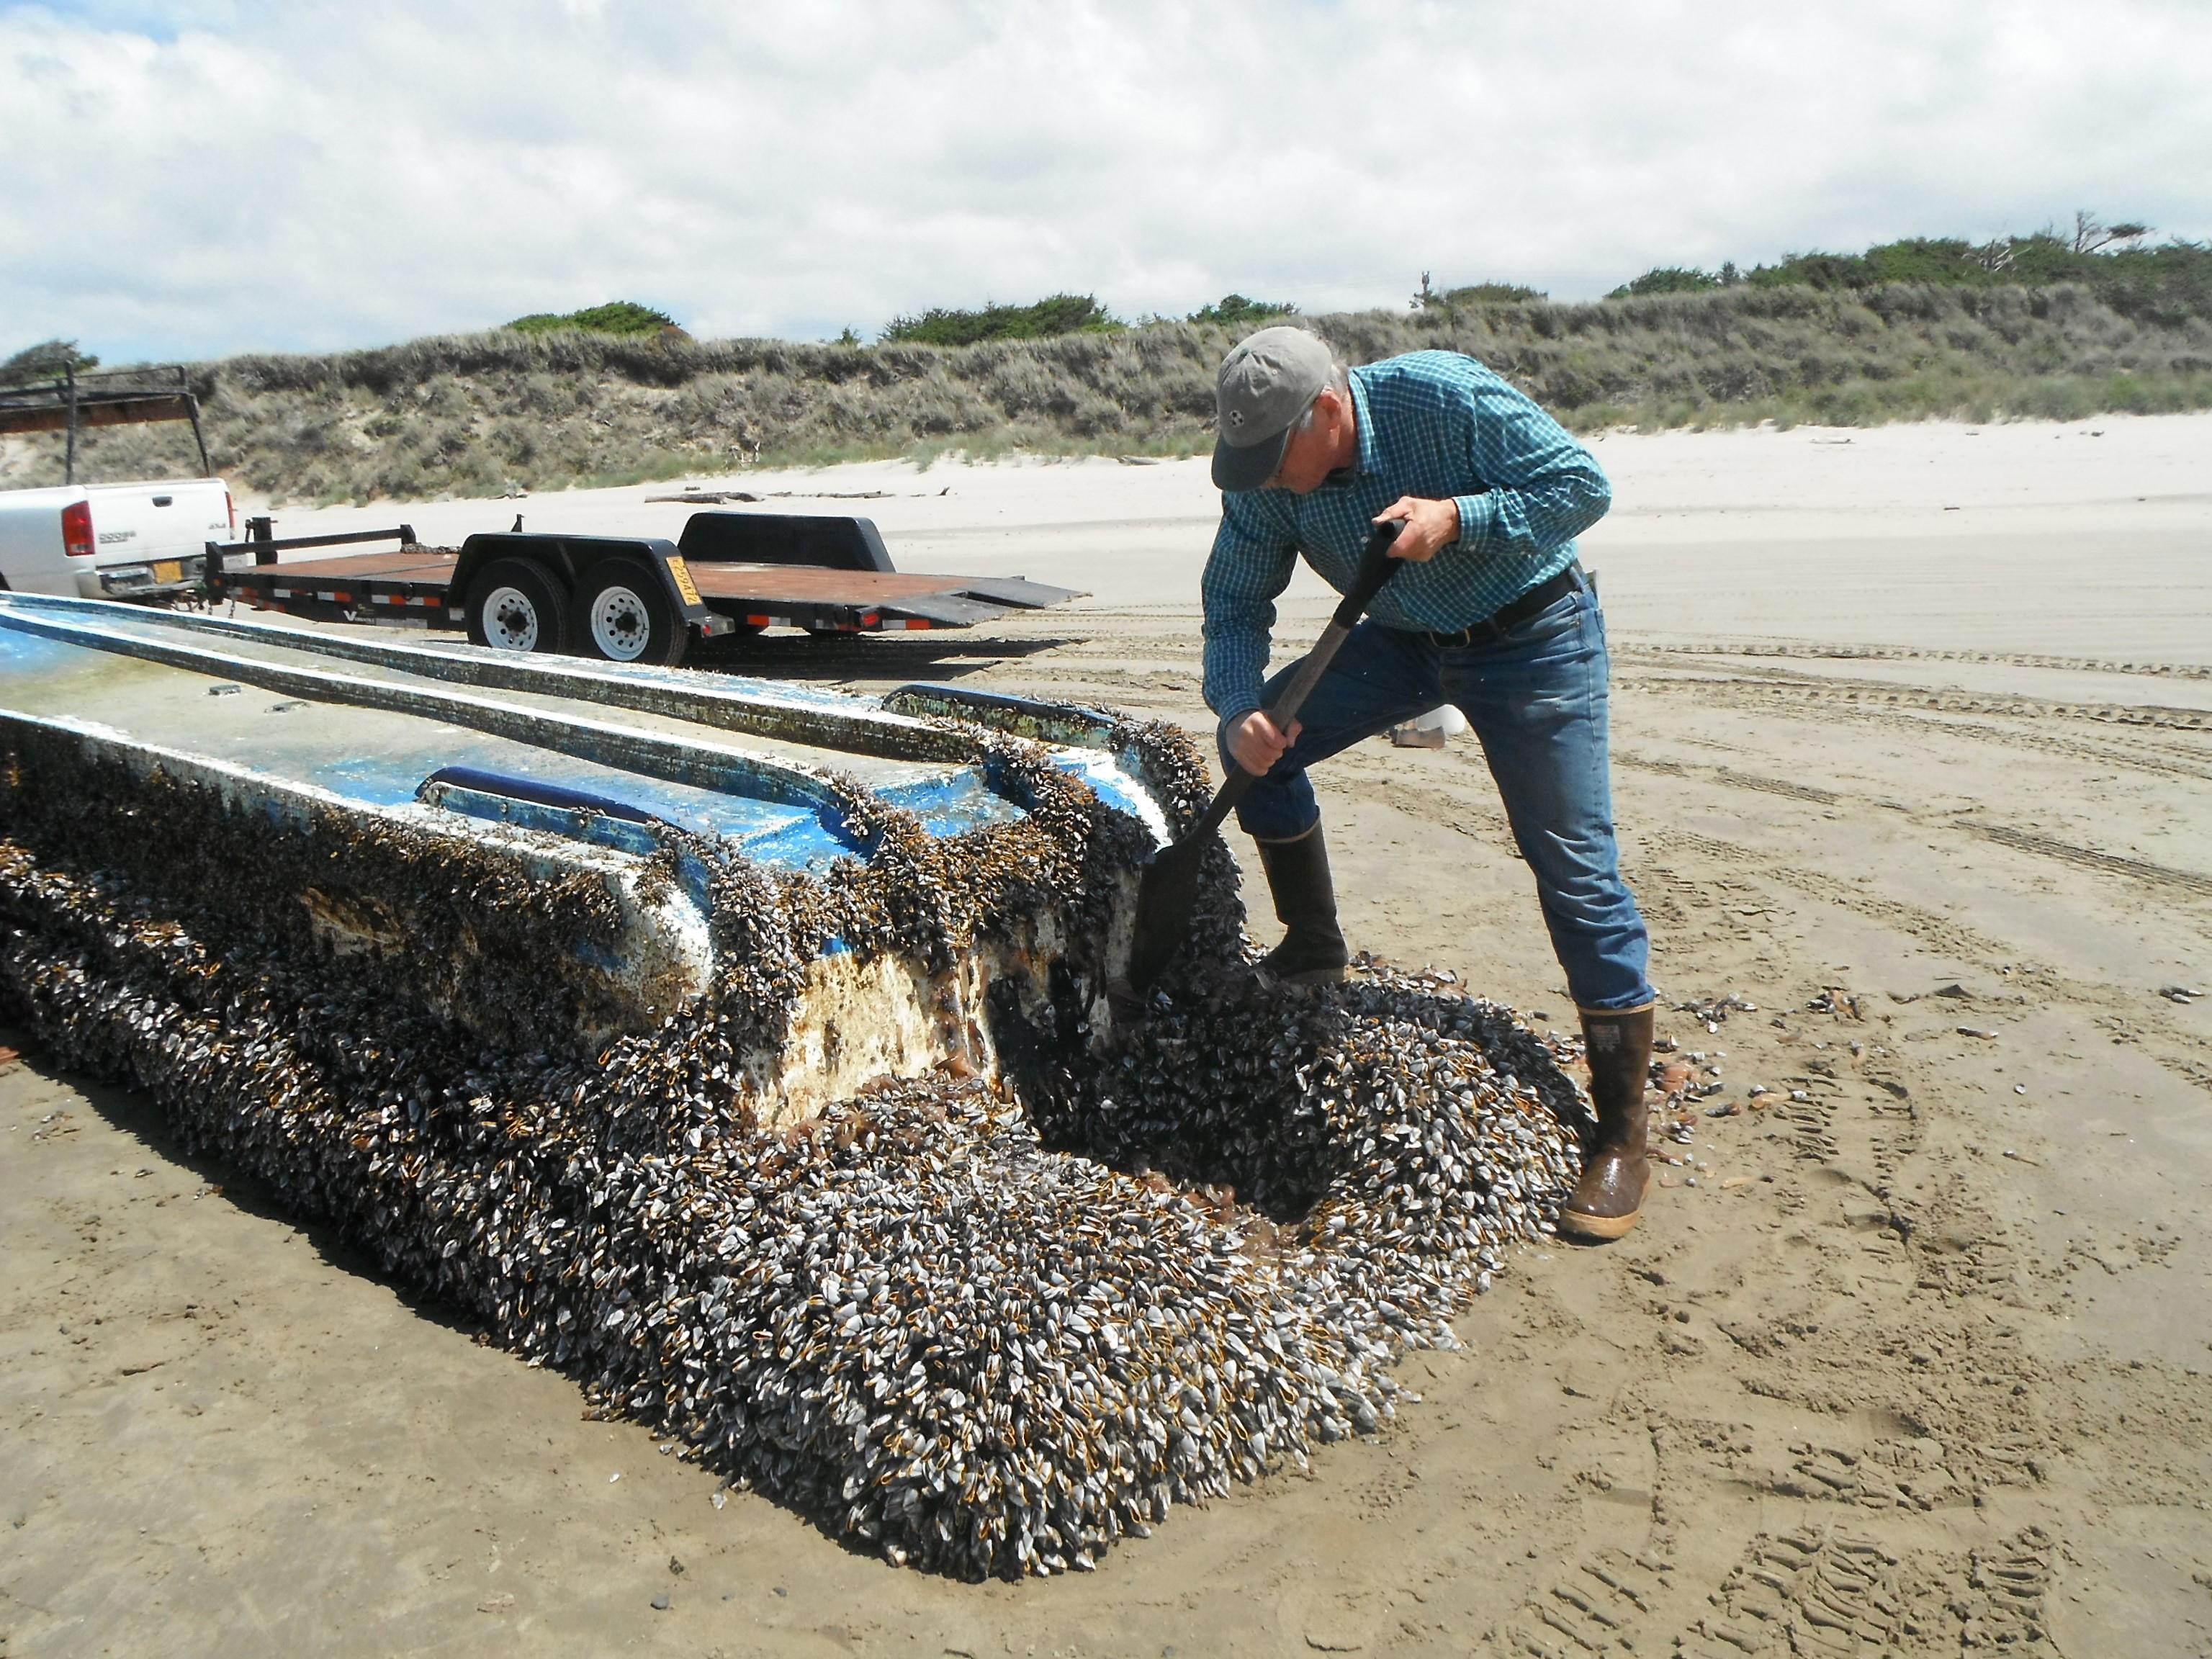 japanese coastal species rode tsunami debris to the us